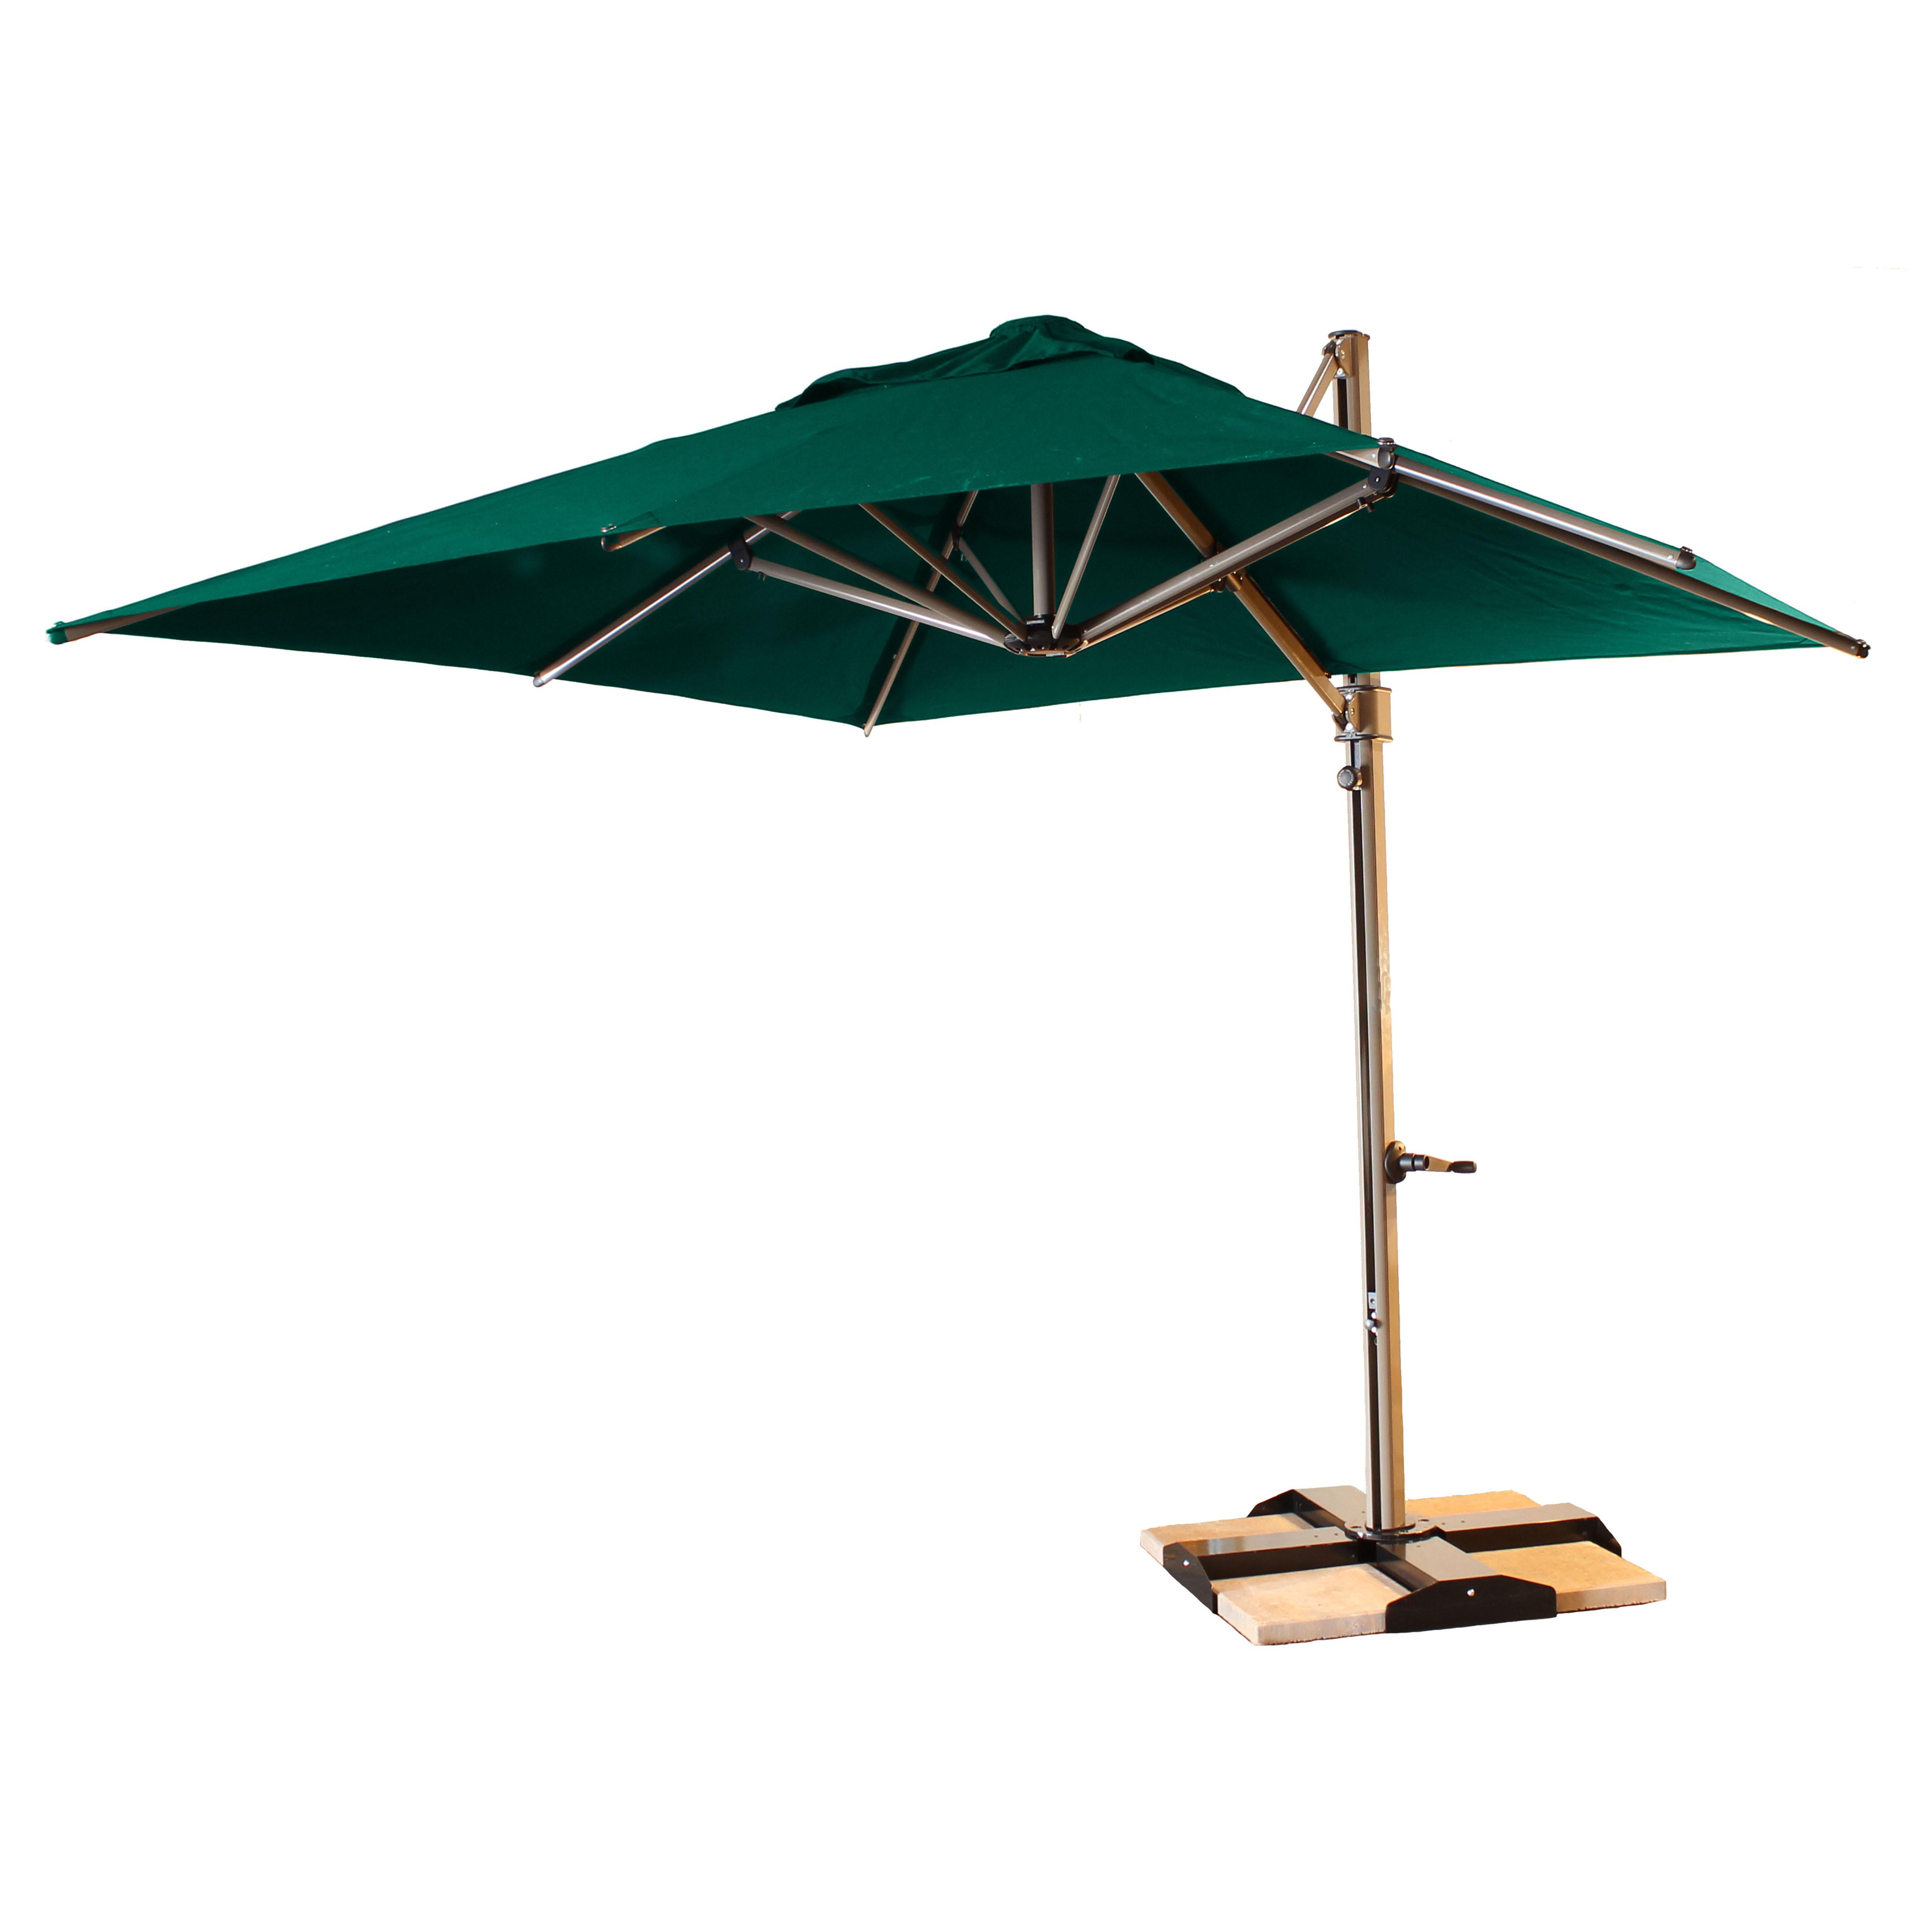 Grosfillex 98702031 umbrella